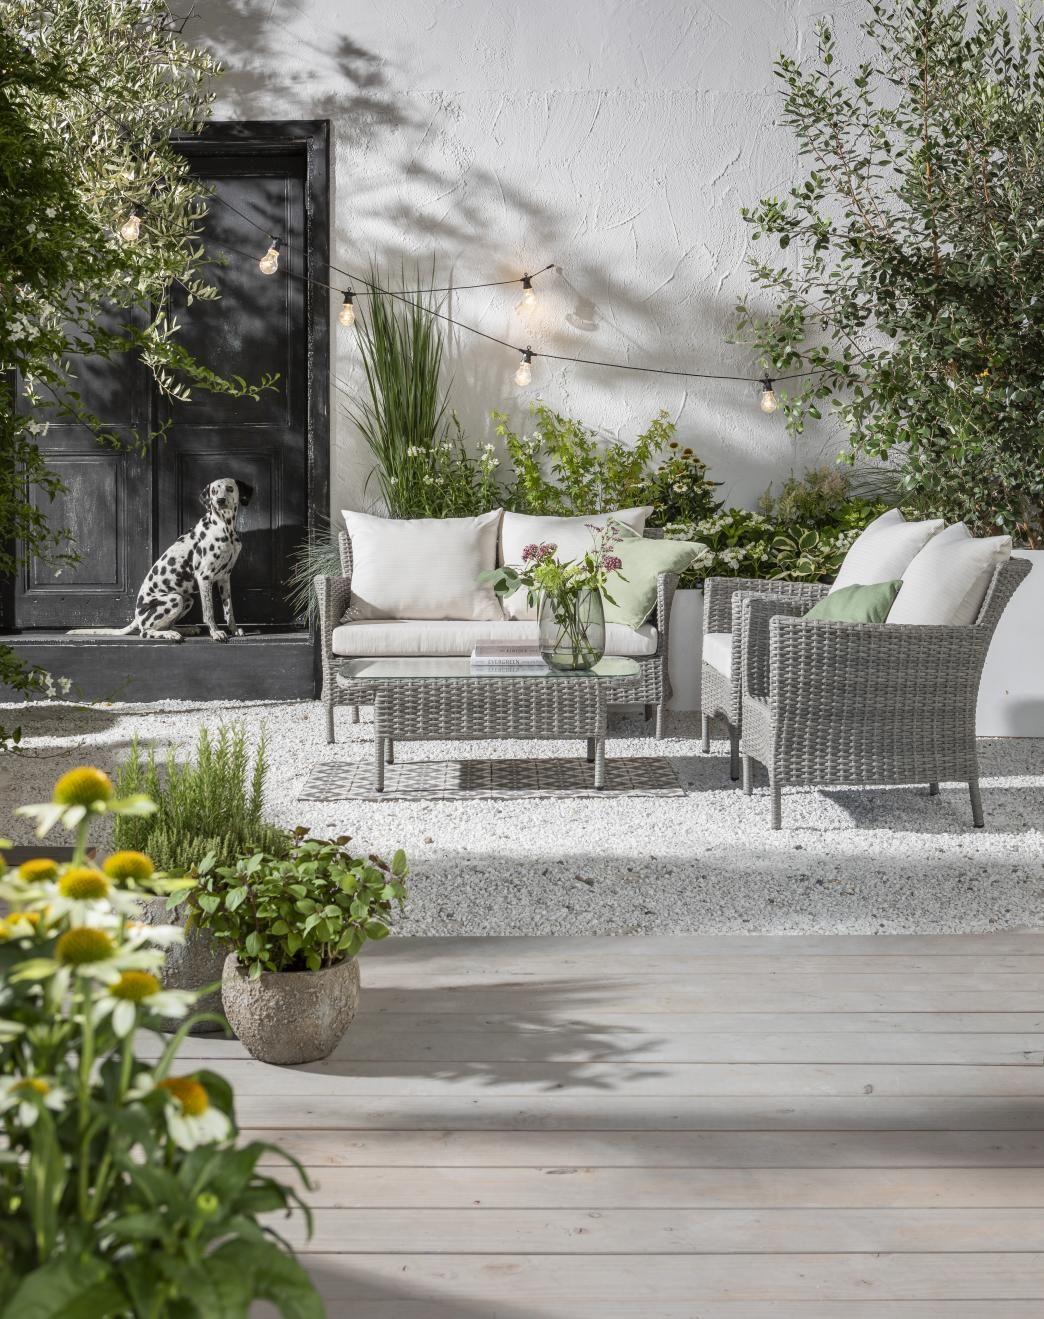 Gartenlounge Lounge Garten Lounge Lounge Tisch